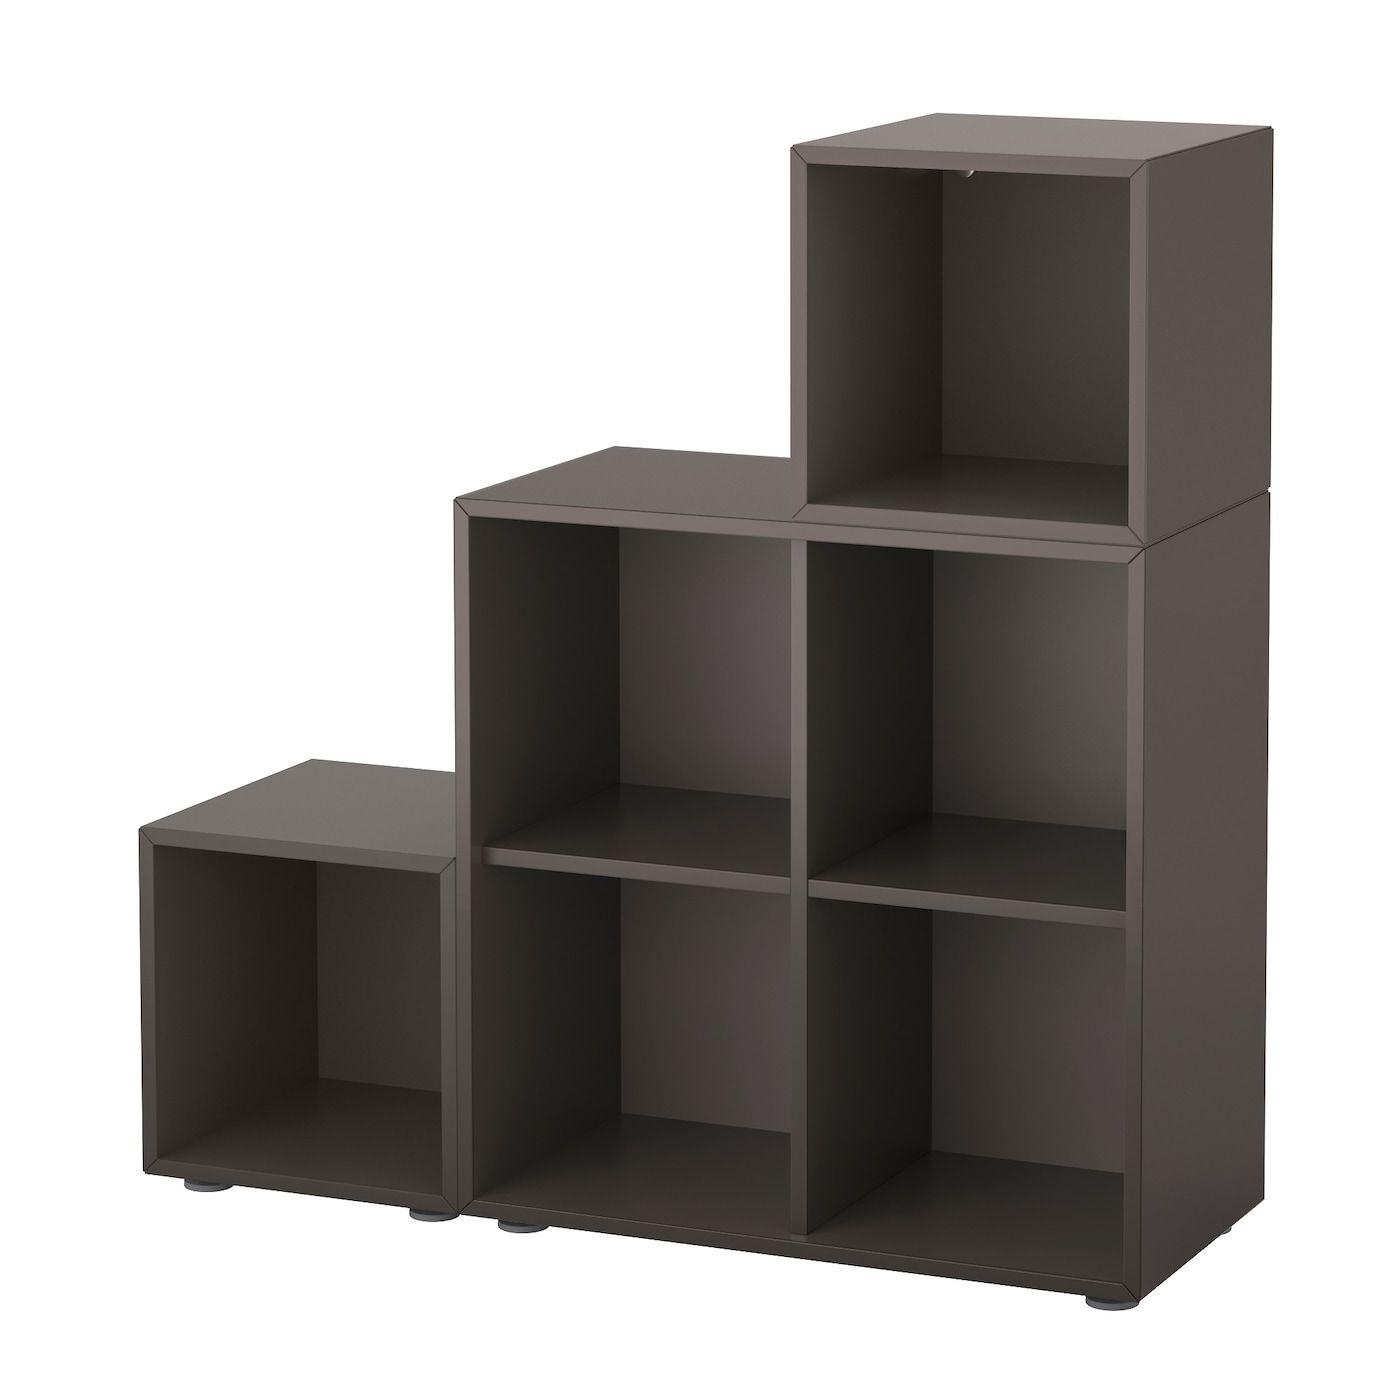 Eket Storage Combination With Feet Dark Gray Ca Ikea In 2020 Eket Ikea Eket Ikea